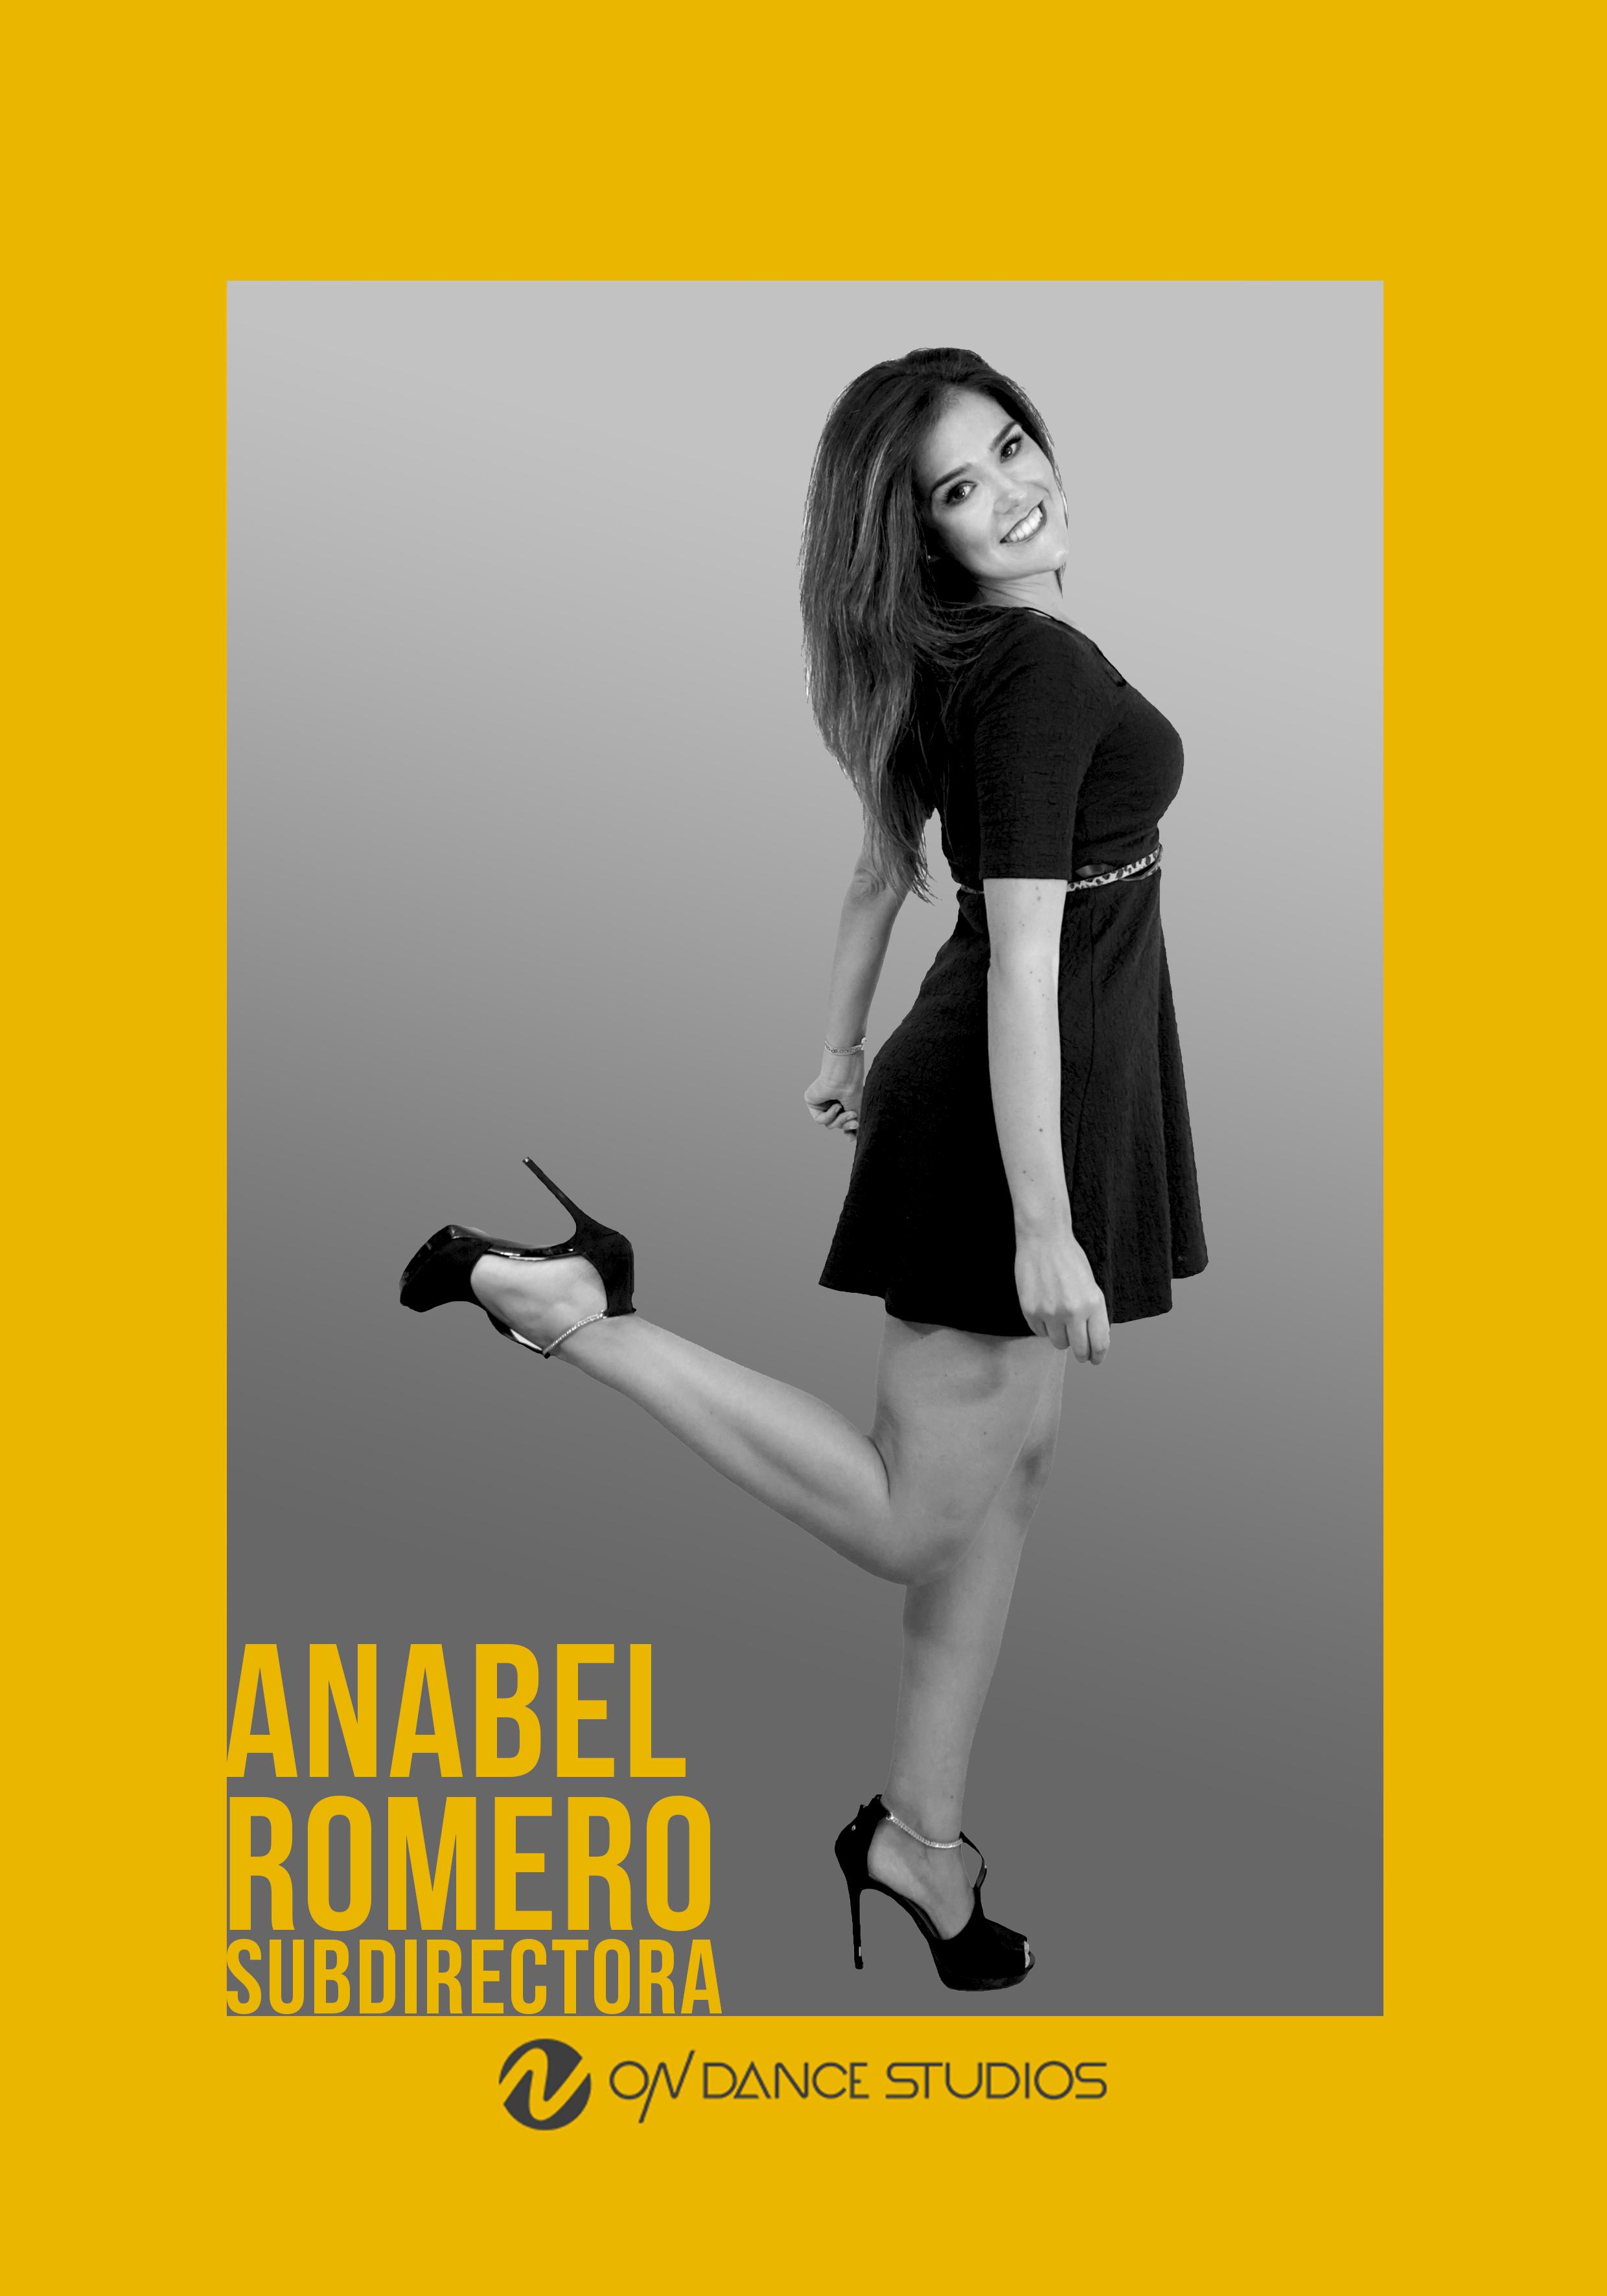 Anabel Romero